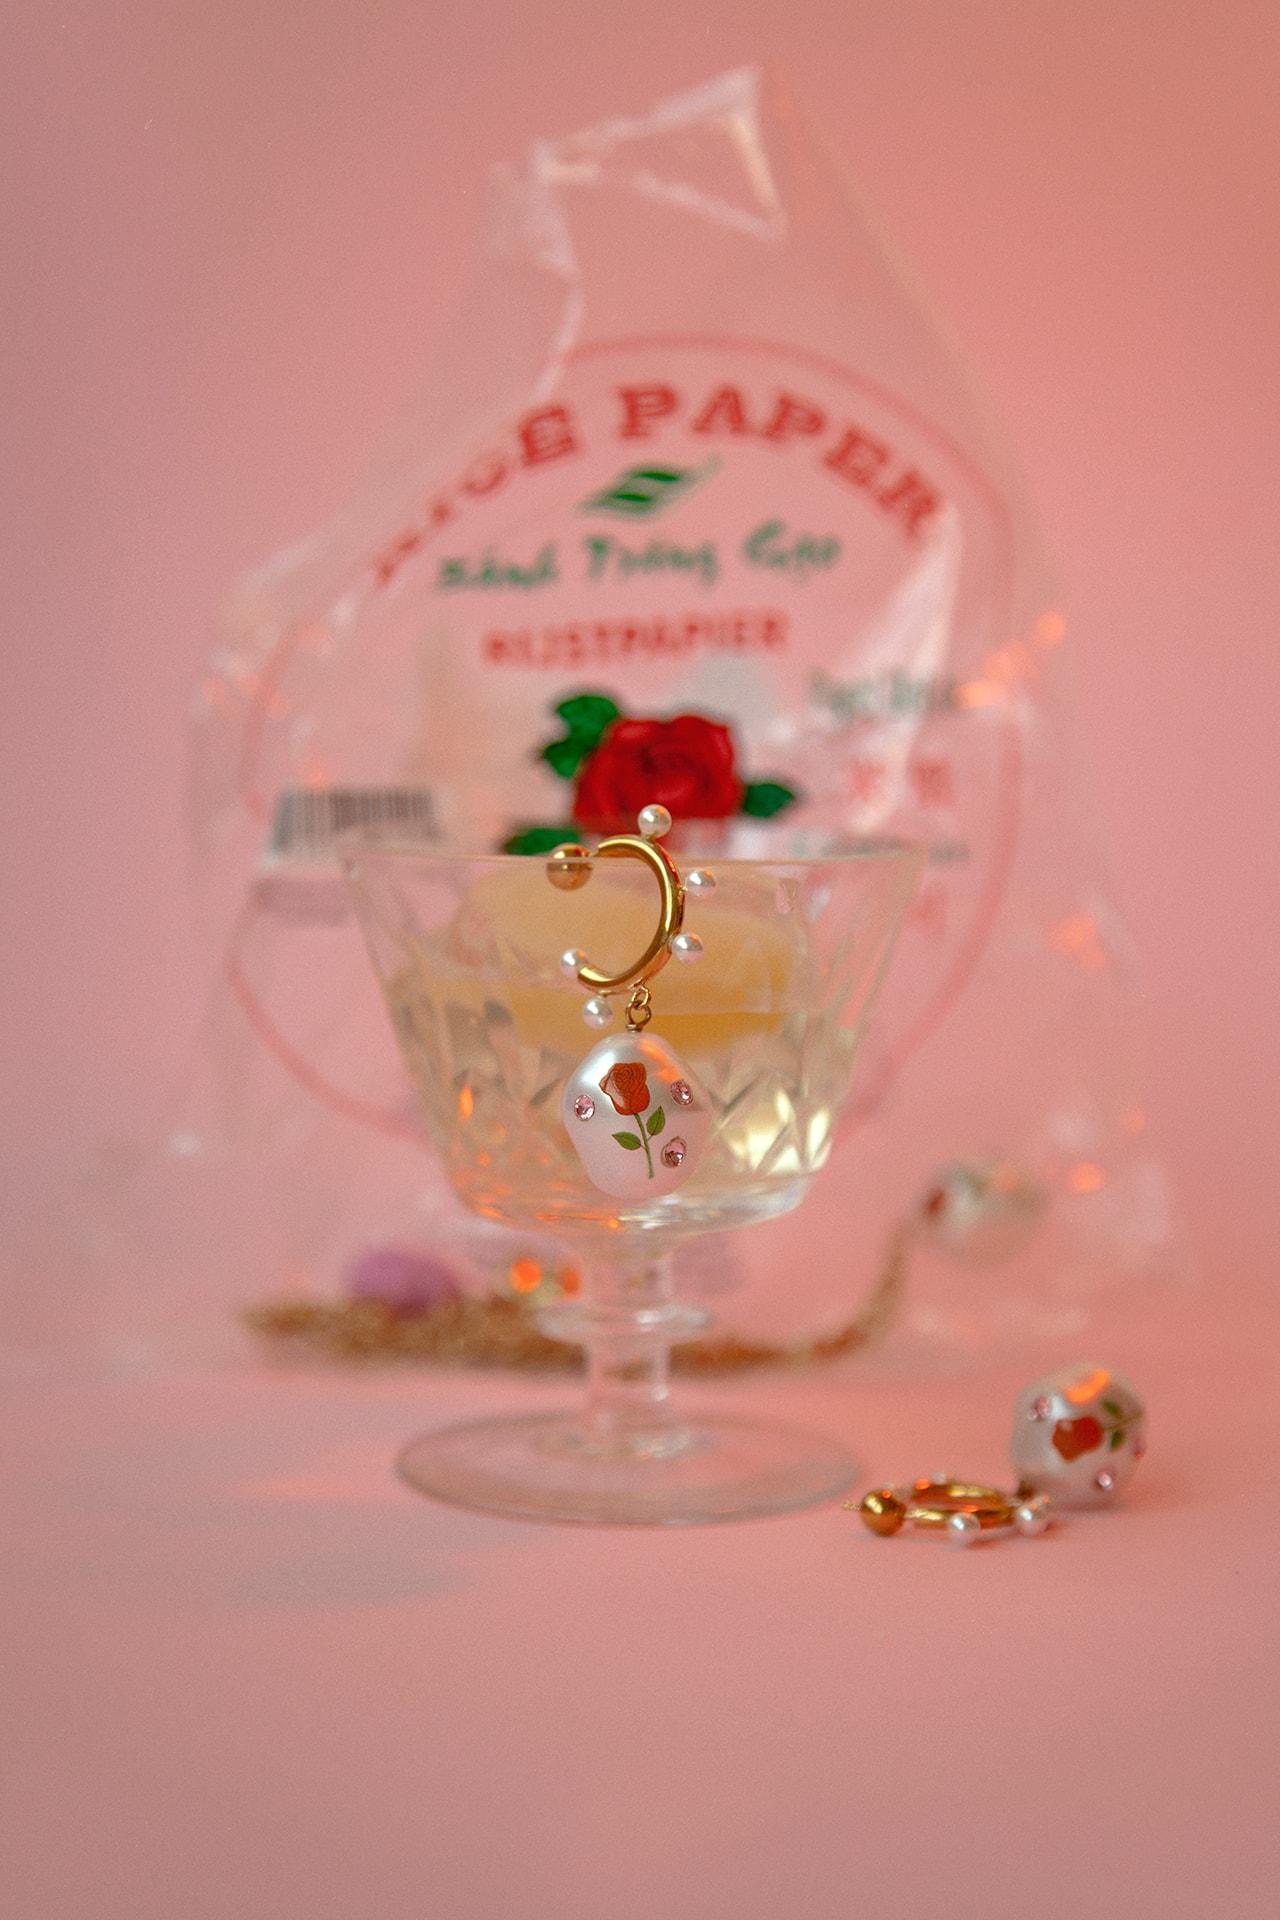 Safsafu Safu Seghatoleslami Gummy Bear Jewelry Brand Gold Earring Campaign Pink Eyeshadow Apple Freckles Model Lookbook